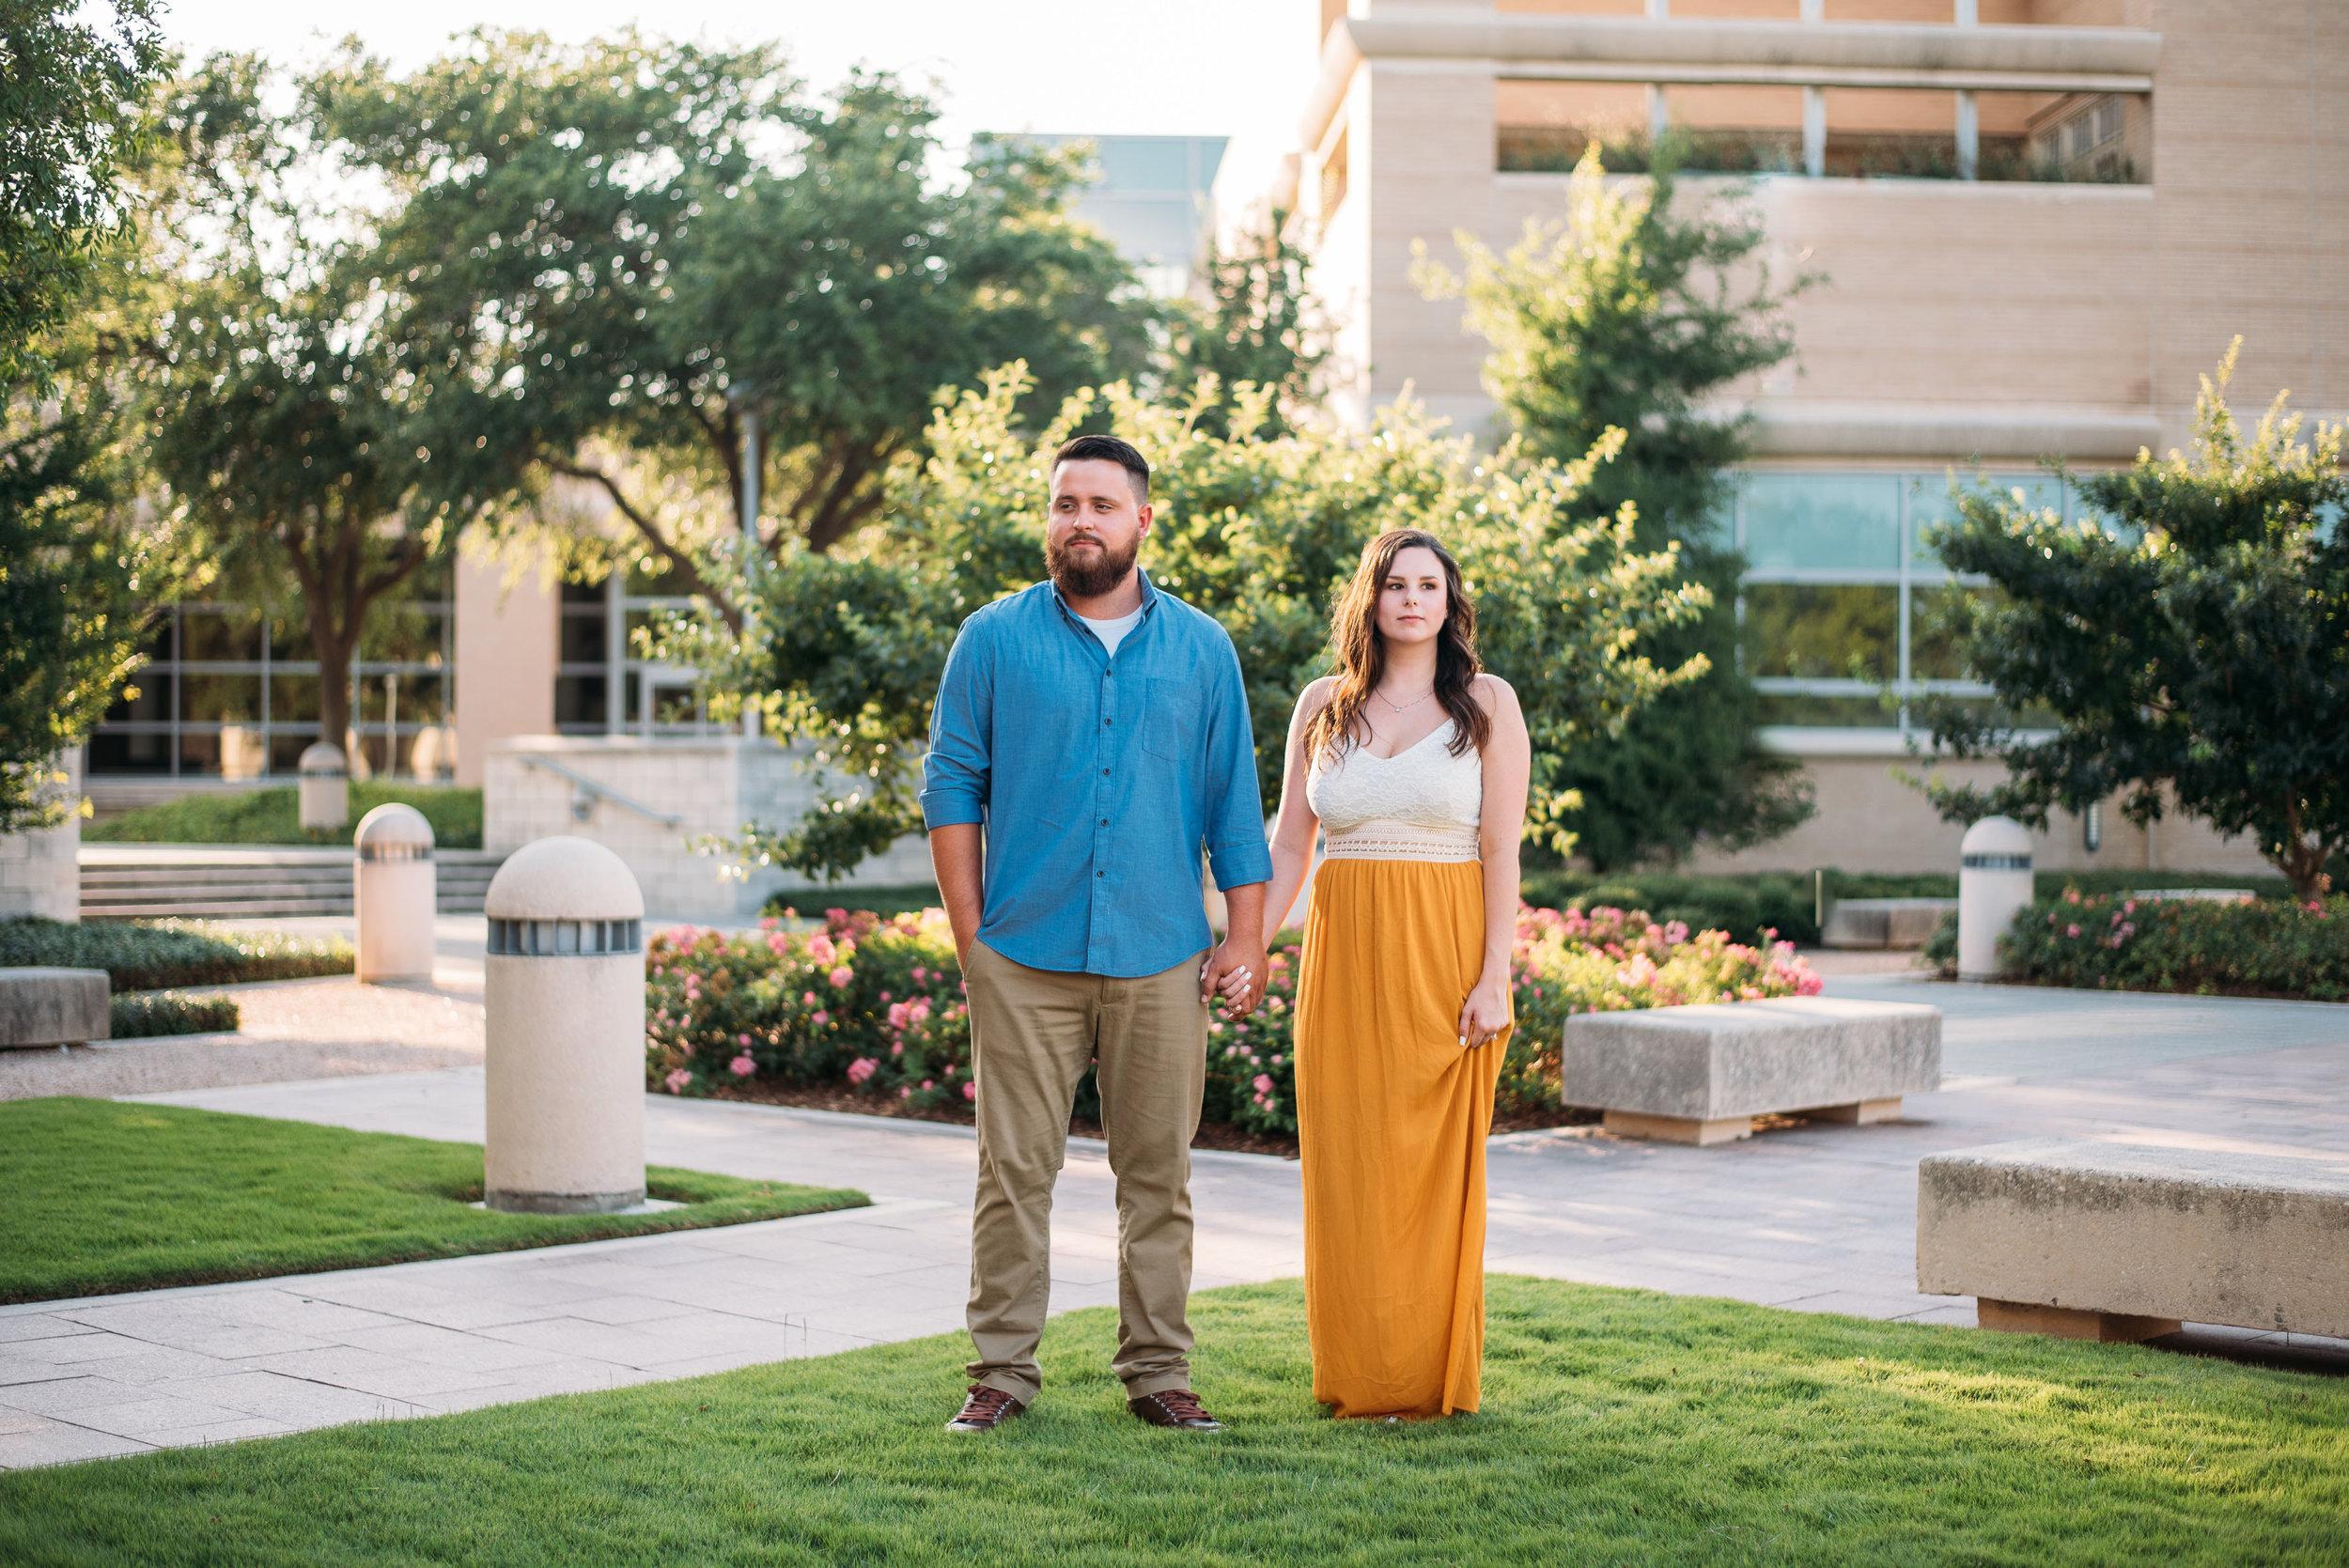 George-Bush-Library-Texas-A&M-University-Engagement-College-Station-Wedding-Photographer-San-Angel-Photo-Mark-Jenna-Matt-Century-Tree-12.jpg